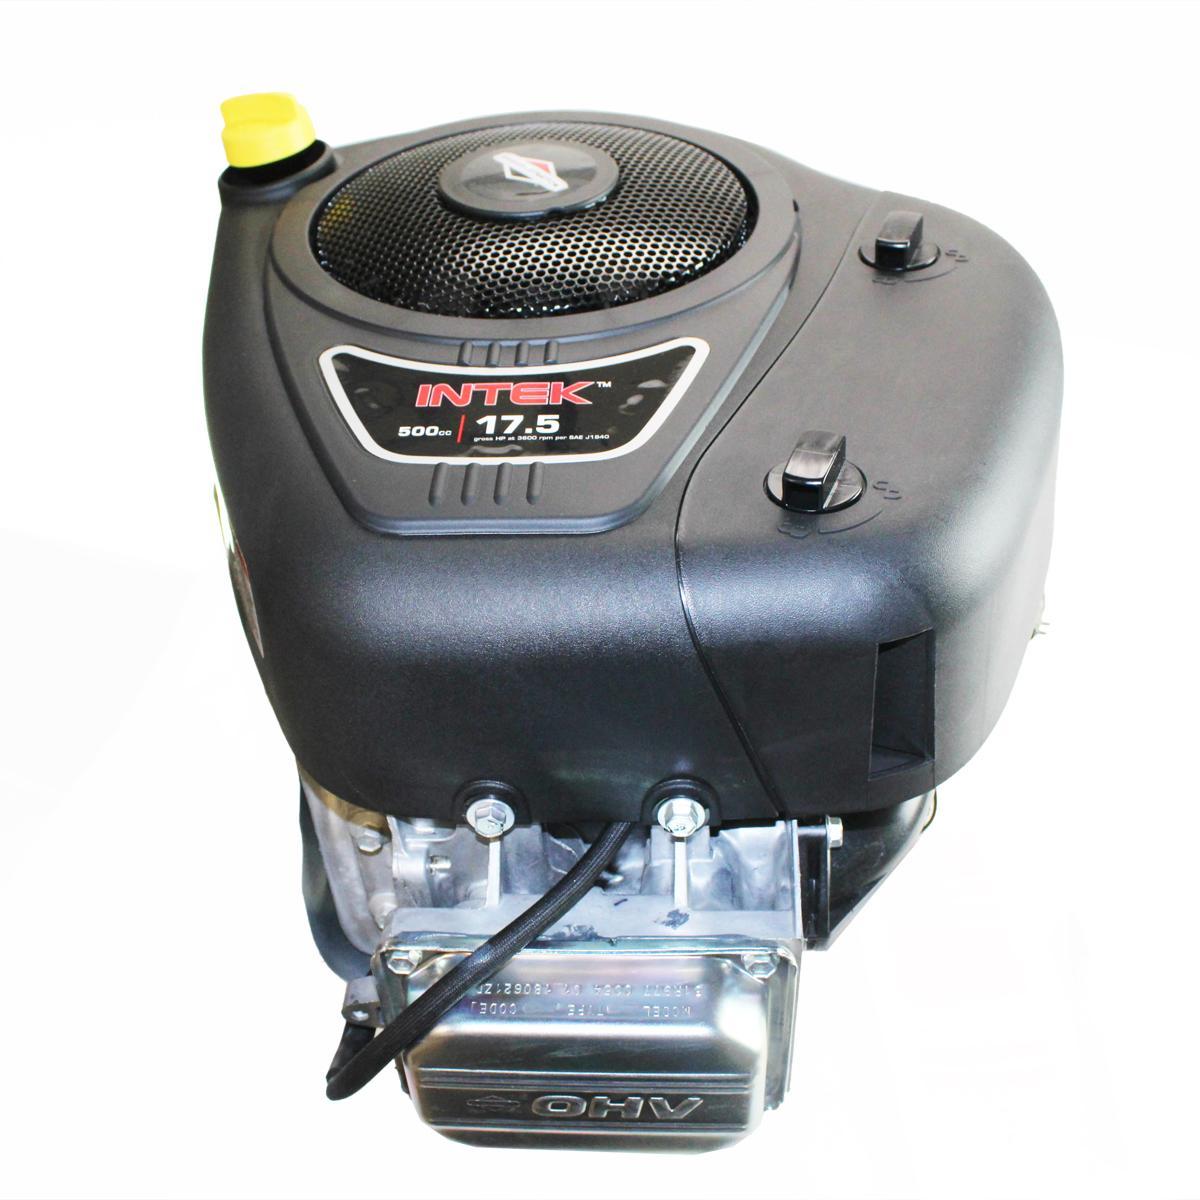 "17.5hp OHV Intek Vertical 1""x3-5/32"" Shaft, Electric Start, 9Amp Alternator, Fuel Pump, Oil Filter, Briggs & Stratton Engine"